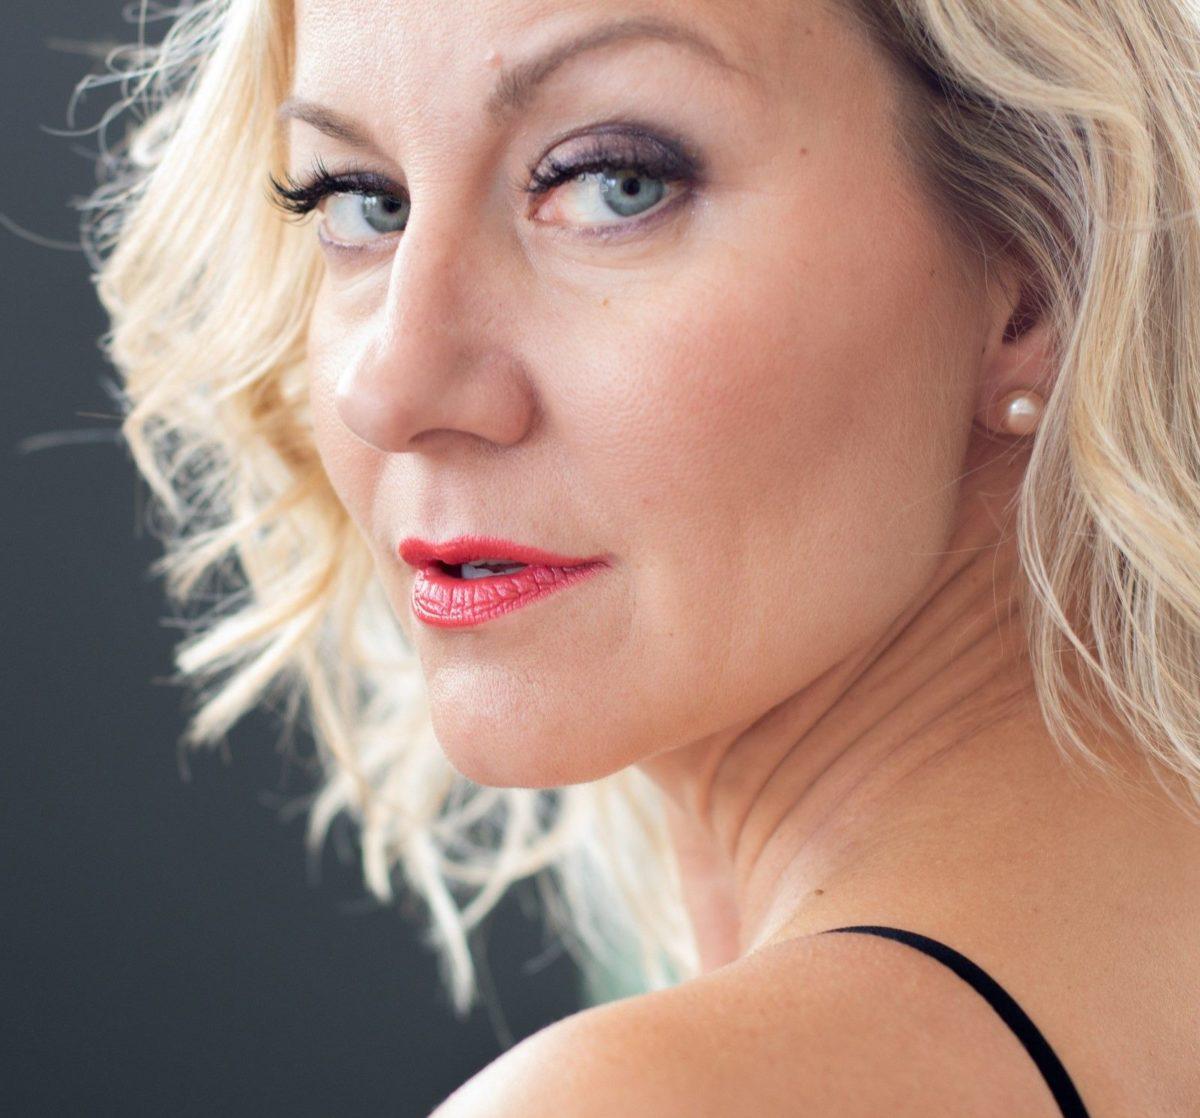 makeup tips for over 40 blue eyes bold lip color